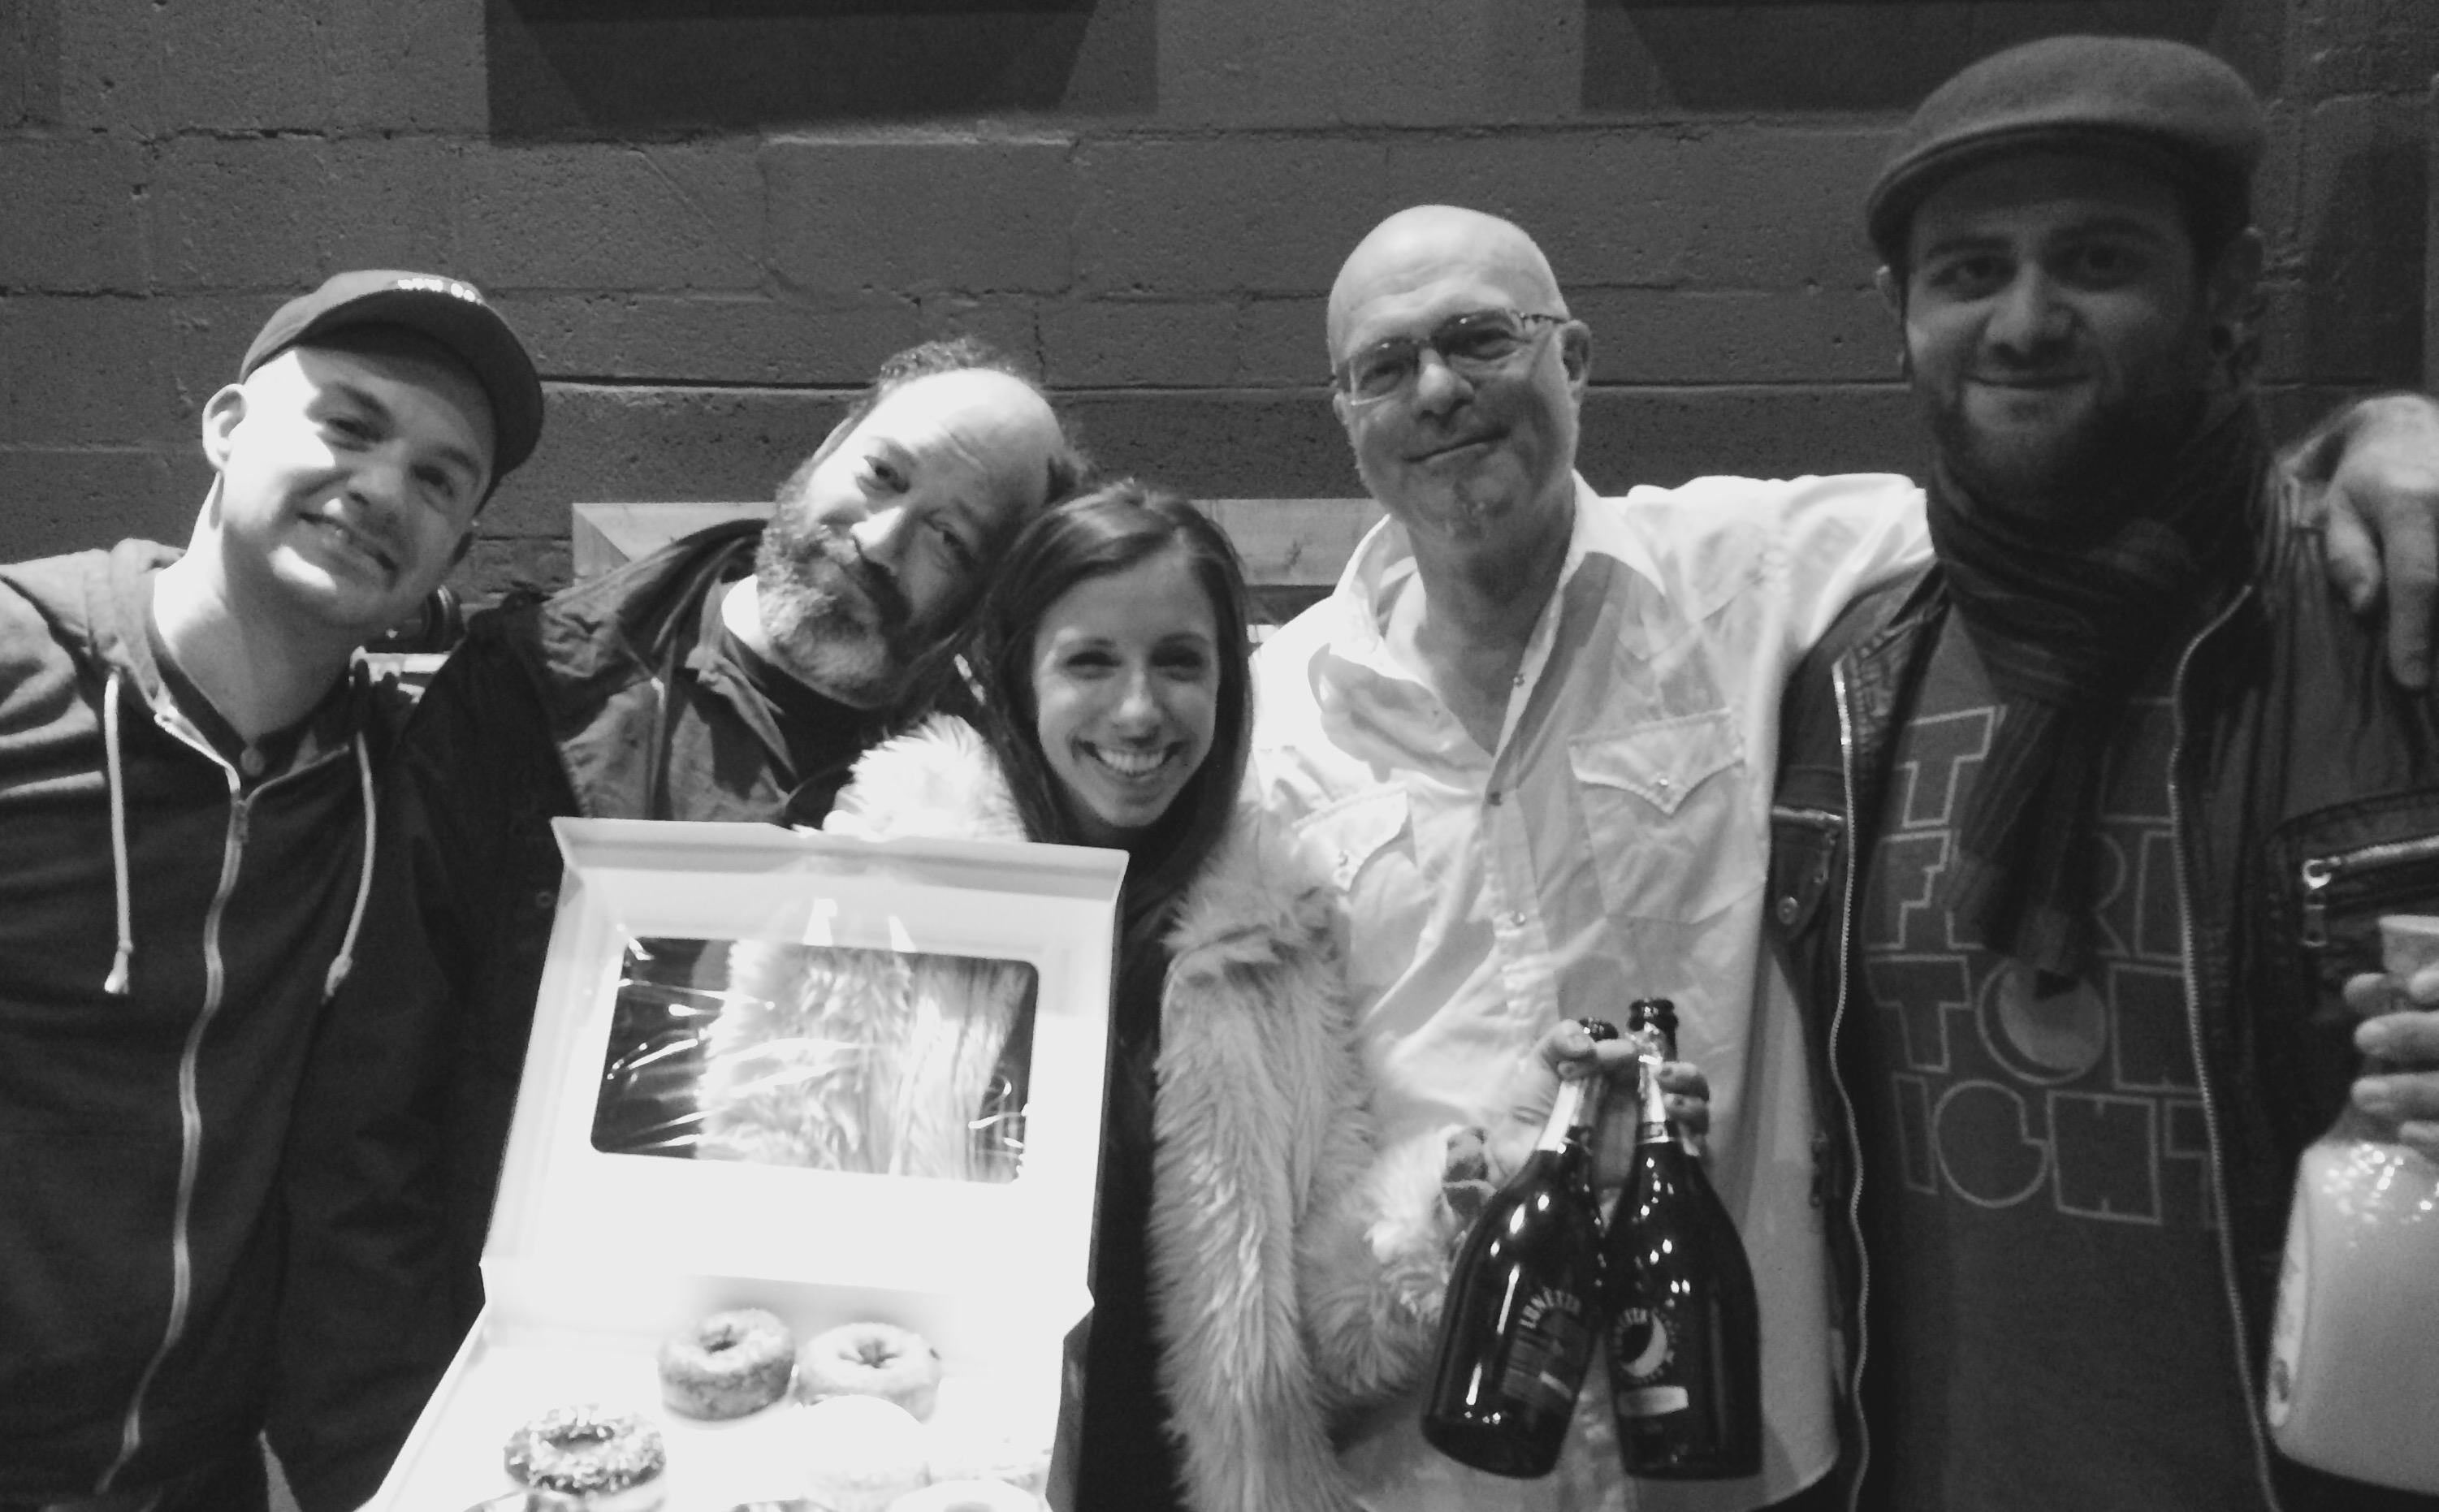 080 - Eric Brace & Karl Straub, Cathy DiToro, Derek Evry